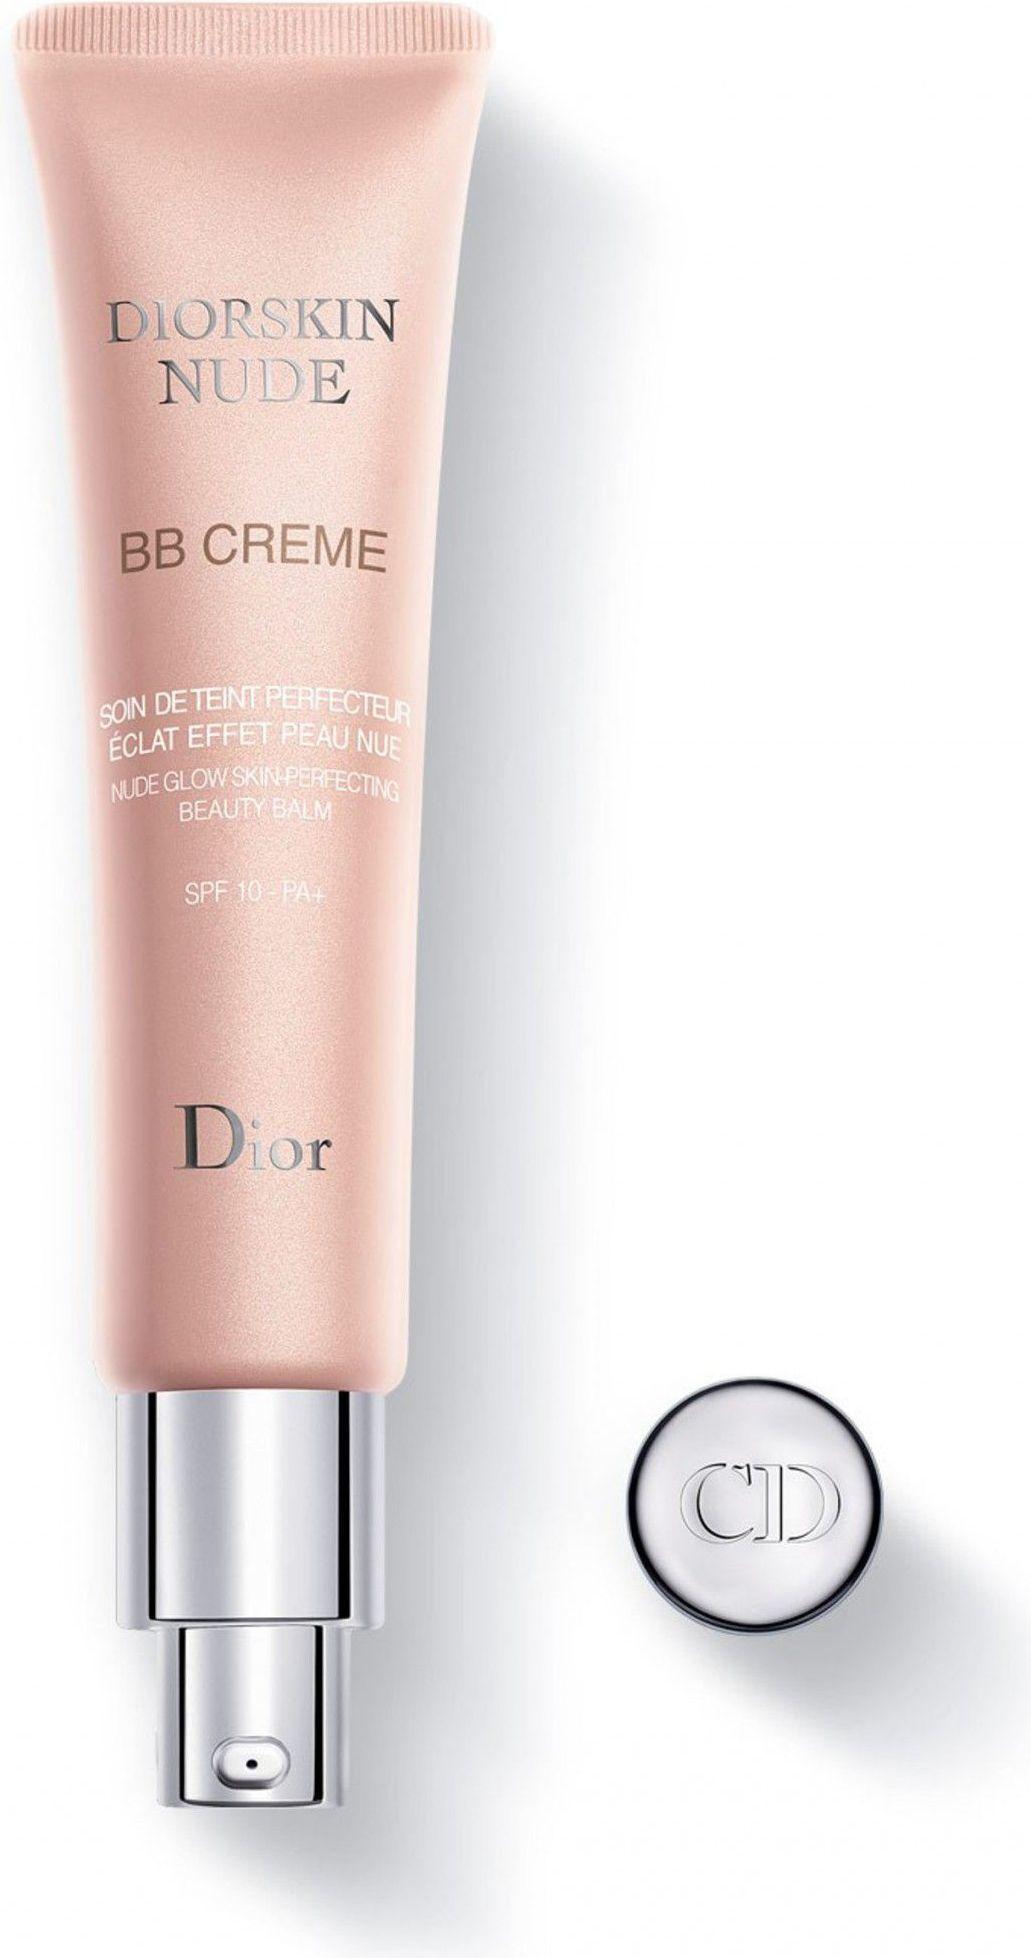 Christian Dior DIORSKIN Nude BB Creme 003 30 ml 1